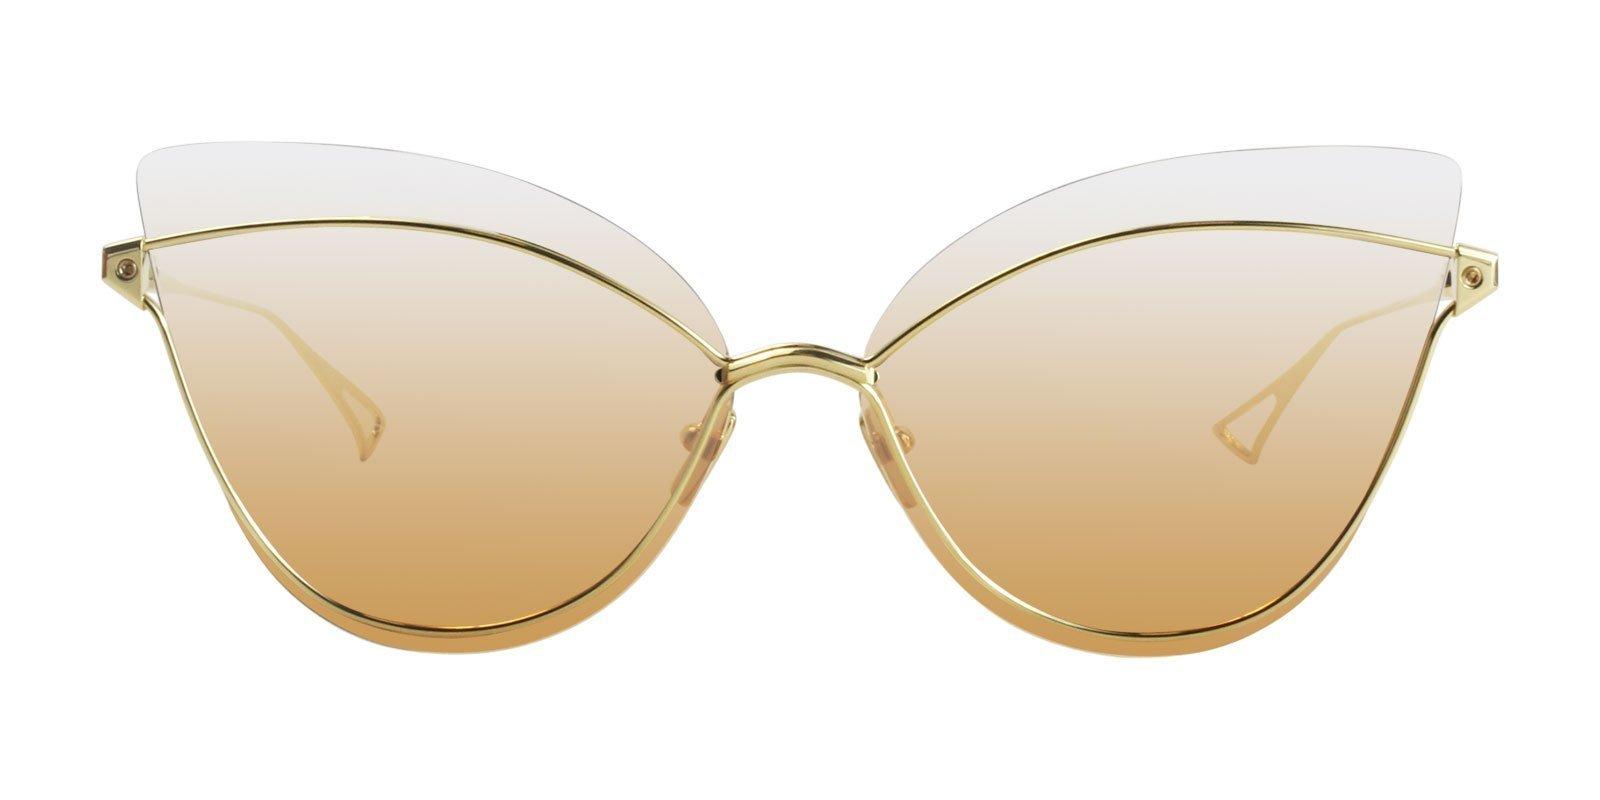 dita-sunglasses-dita-nightbird-one-gld-designer-eyes-811005032367.jpg